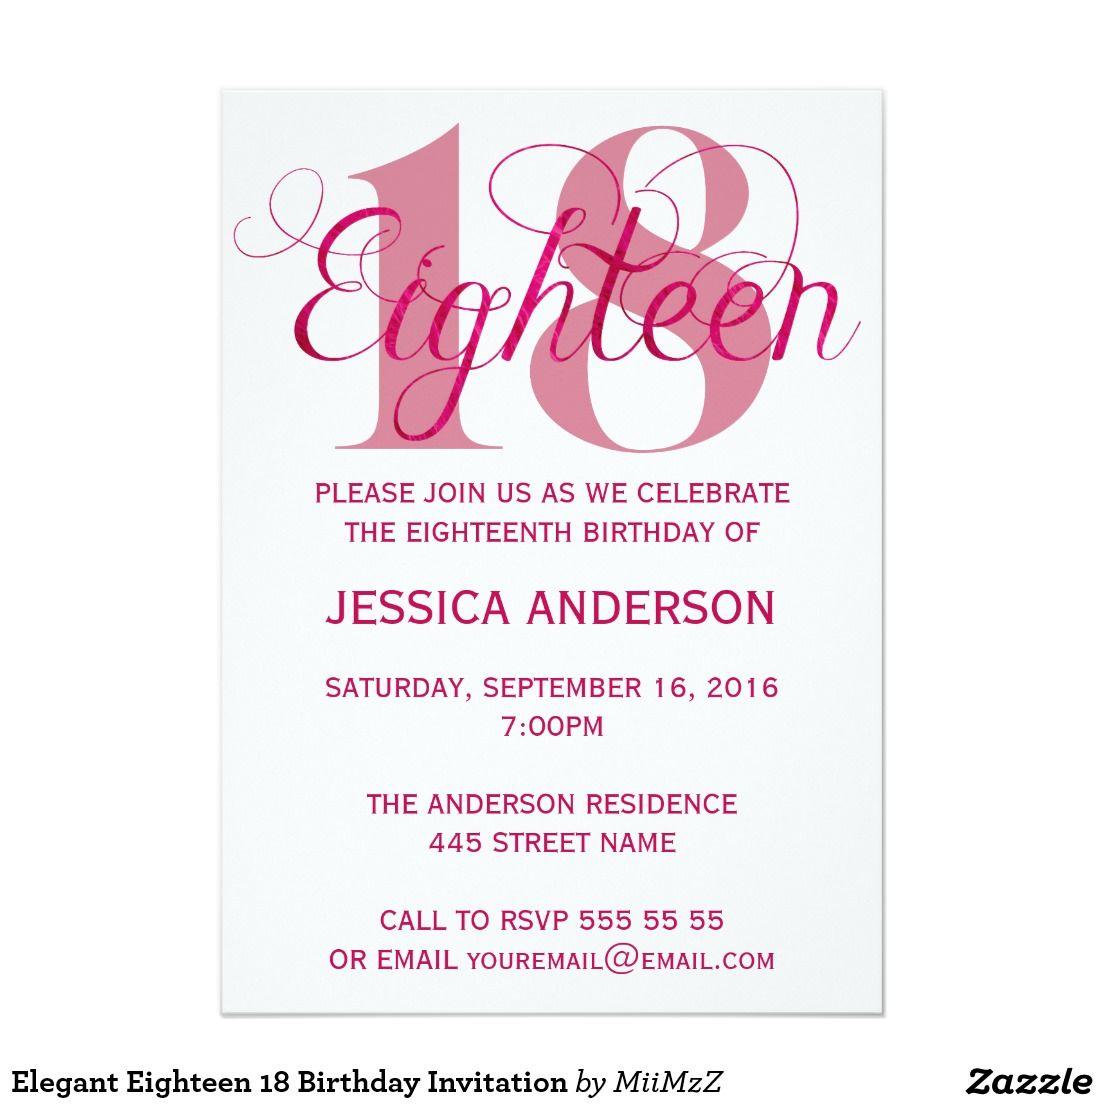 Elegant Eighteen 18 Birthday Invitation | Teens 13-17 Birthday ...